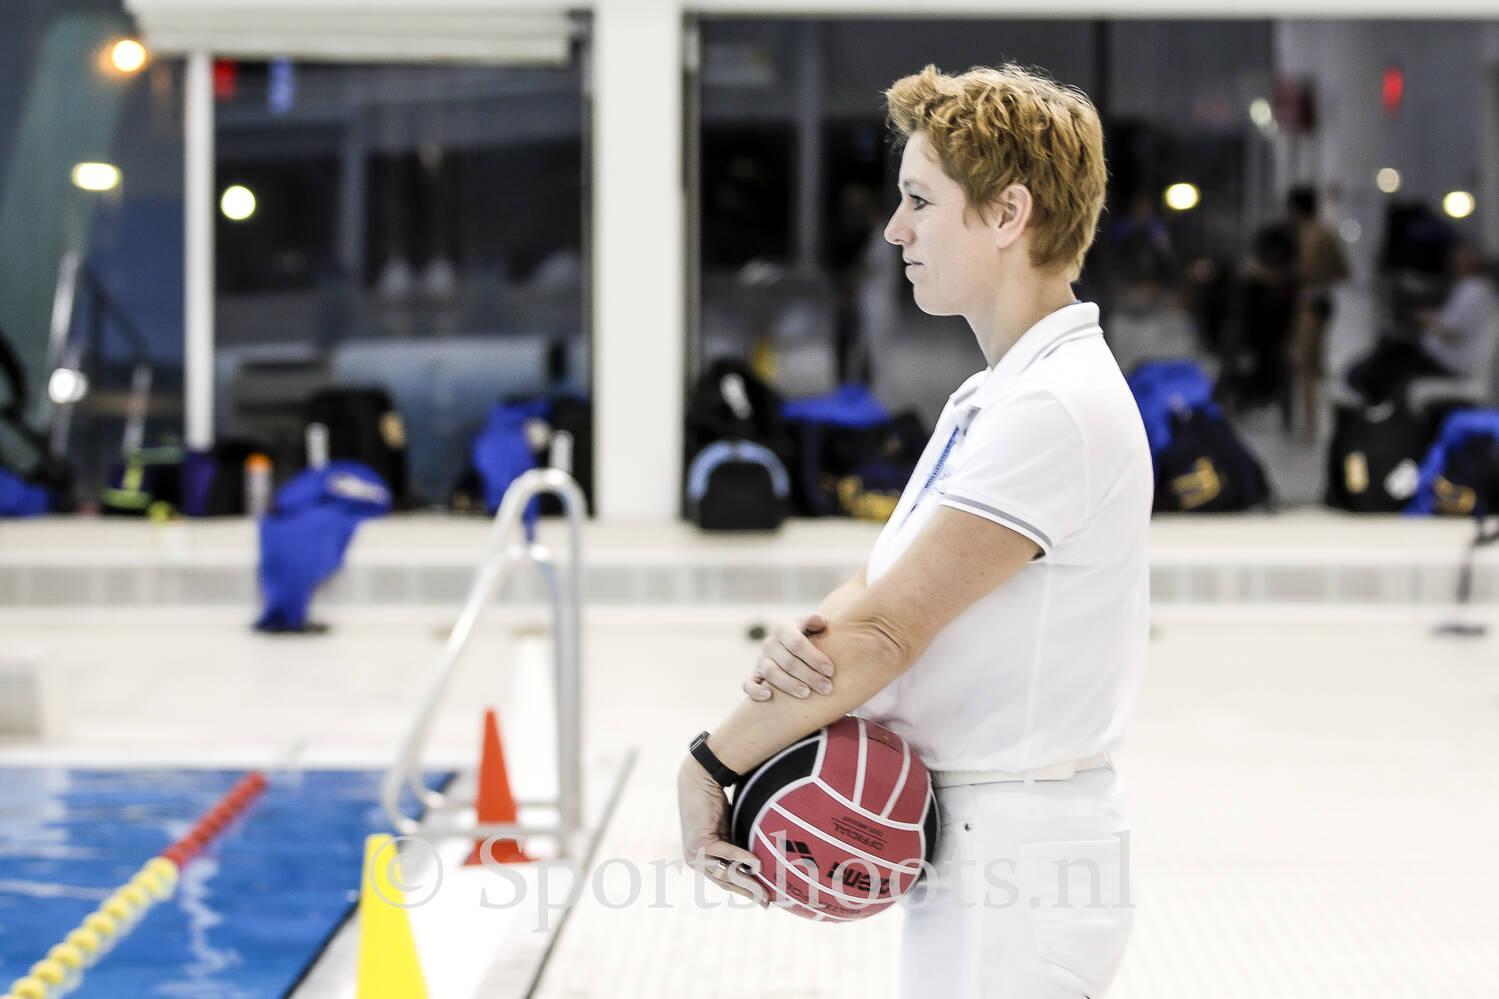 Daniëlle Schram Waterpoloster, Coaching en Referee